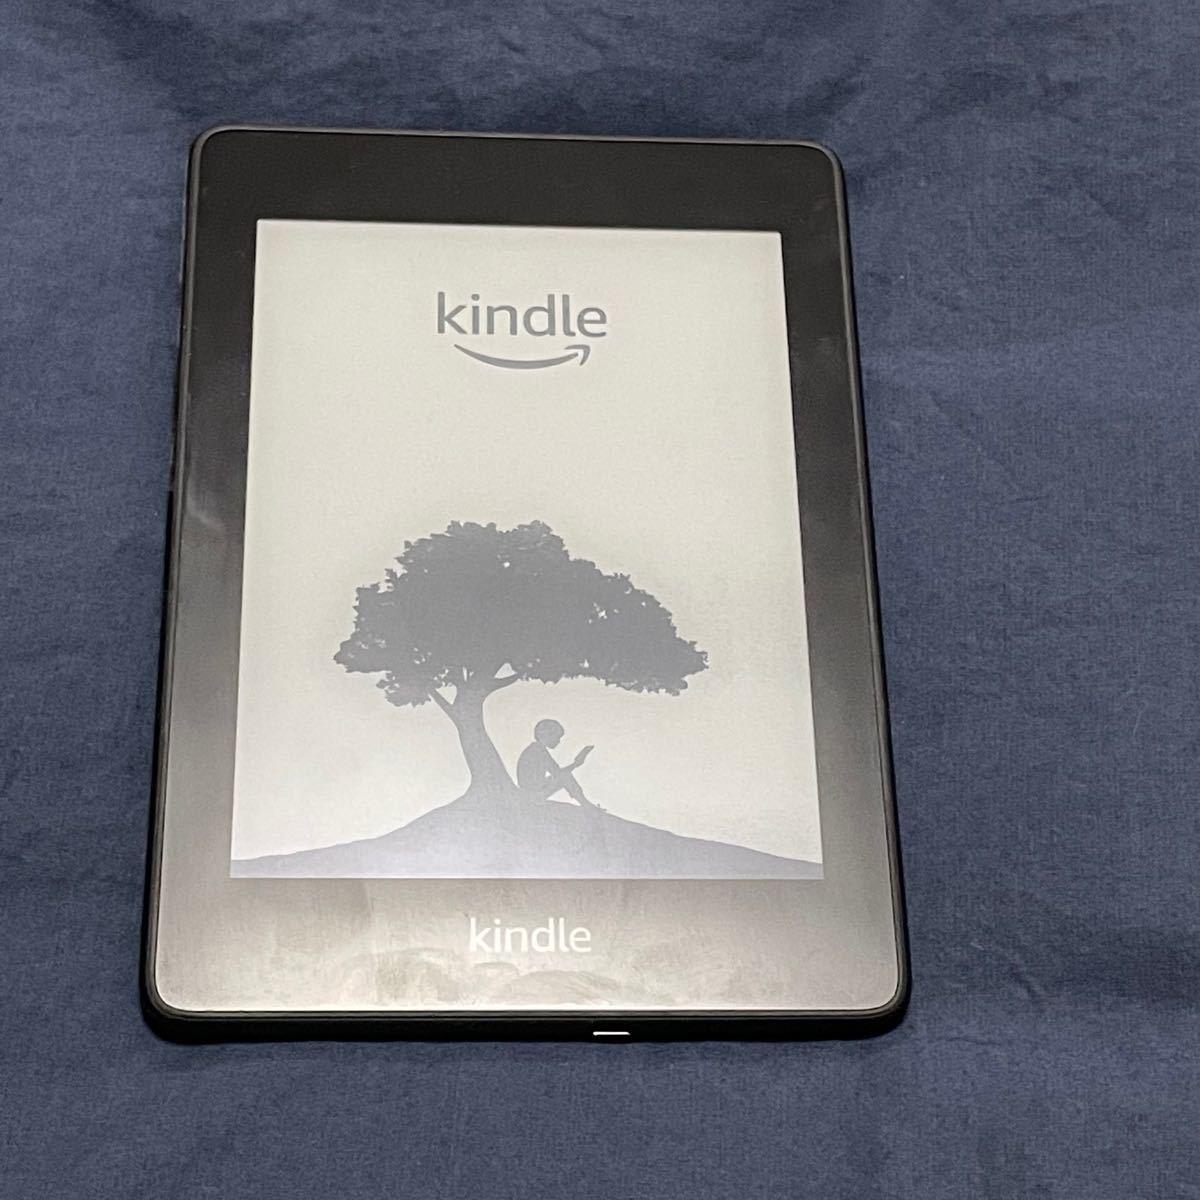 Kindle Paperwhite 防水機能搭載 wifi+4G 32GB ブラック 電子書籍リーダー 広告なしモデル